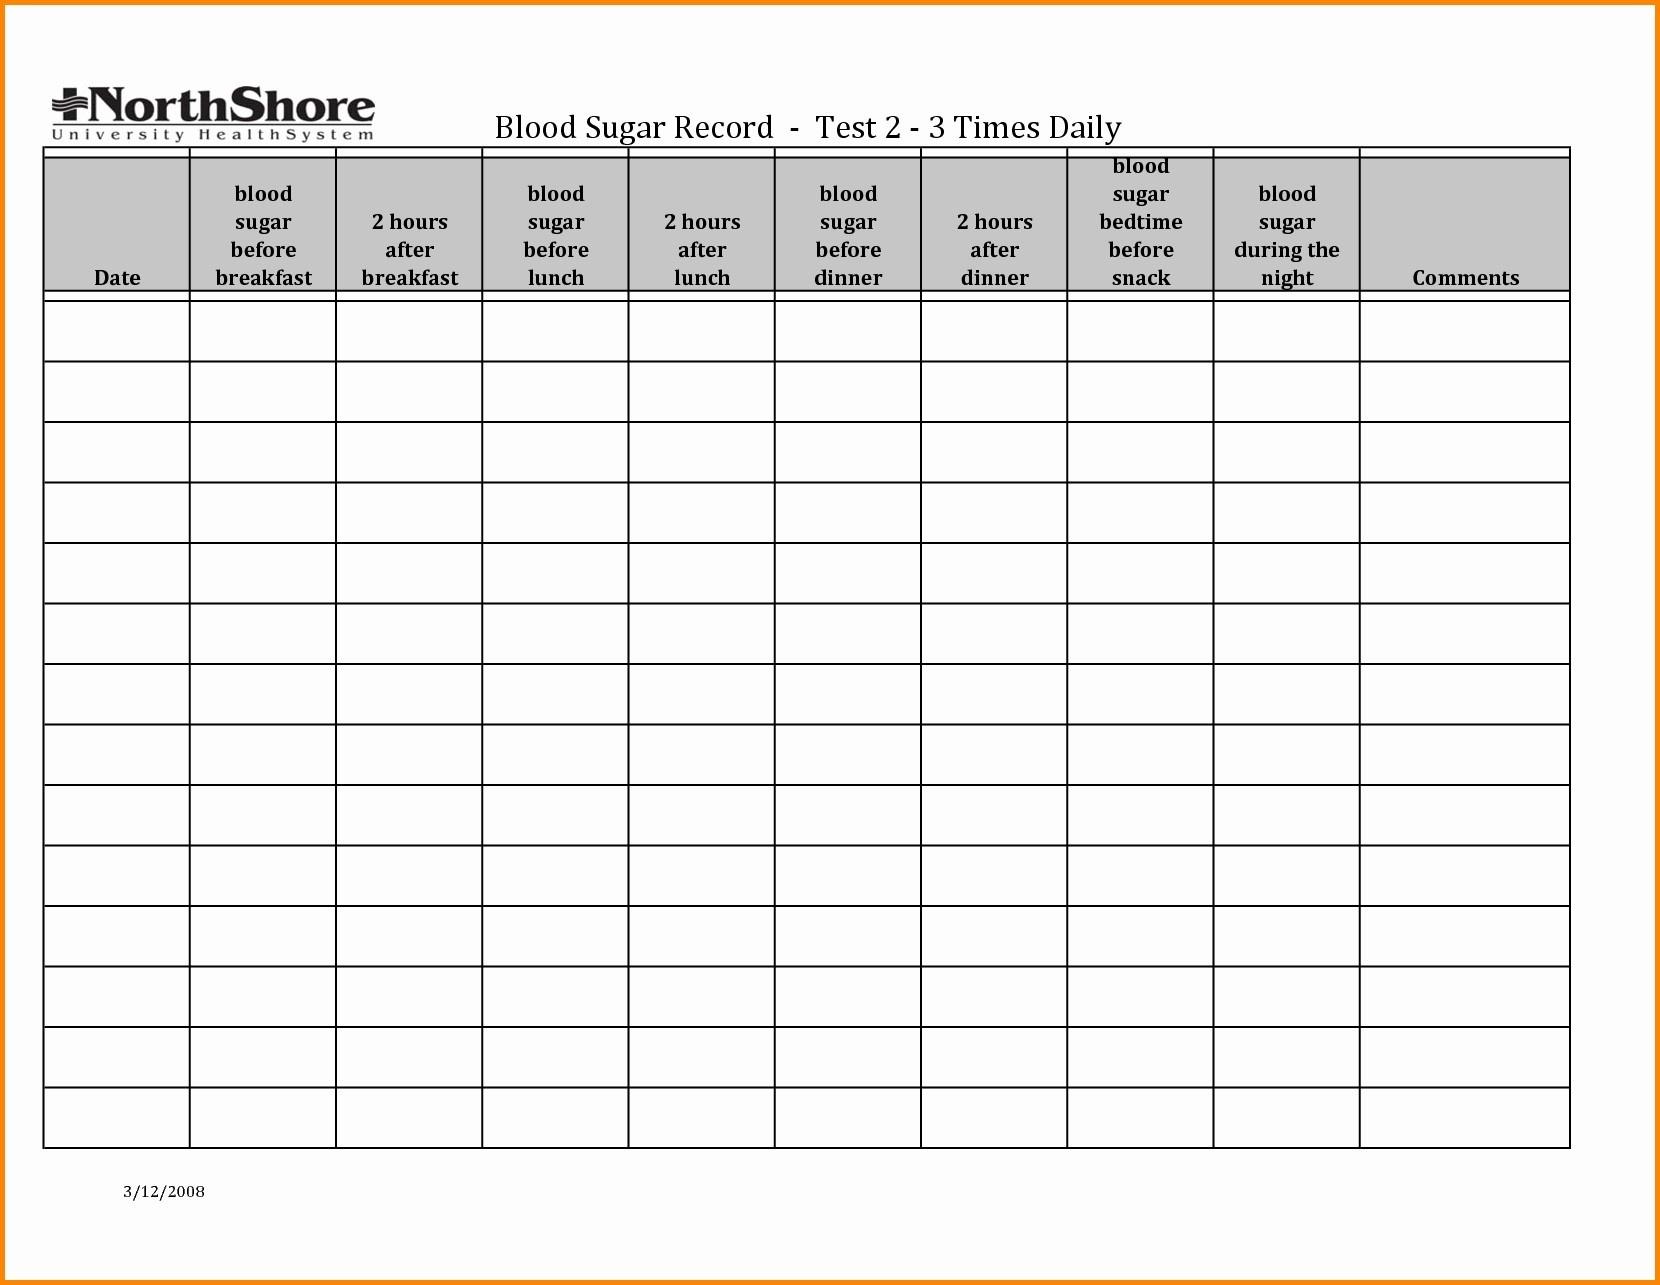 Diabetic Log Sheets Unique Diabetic Blood Sugar Log Sheet - Free Diabetic Log Book Printable